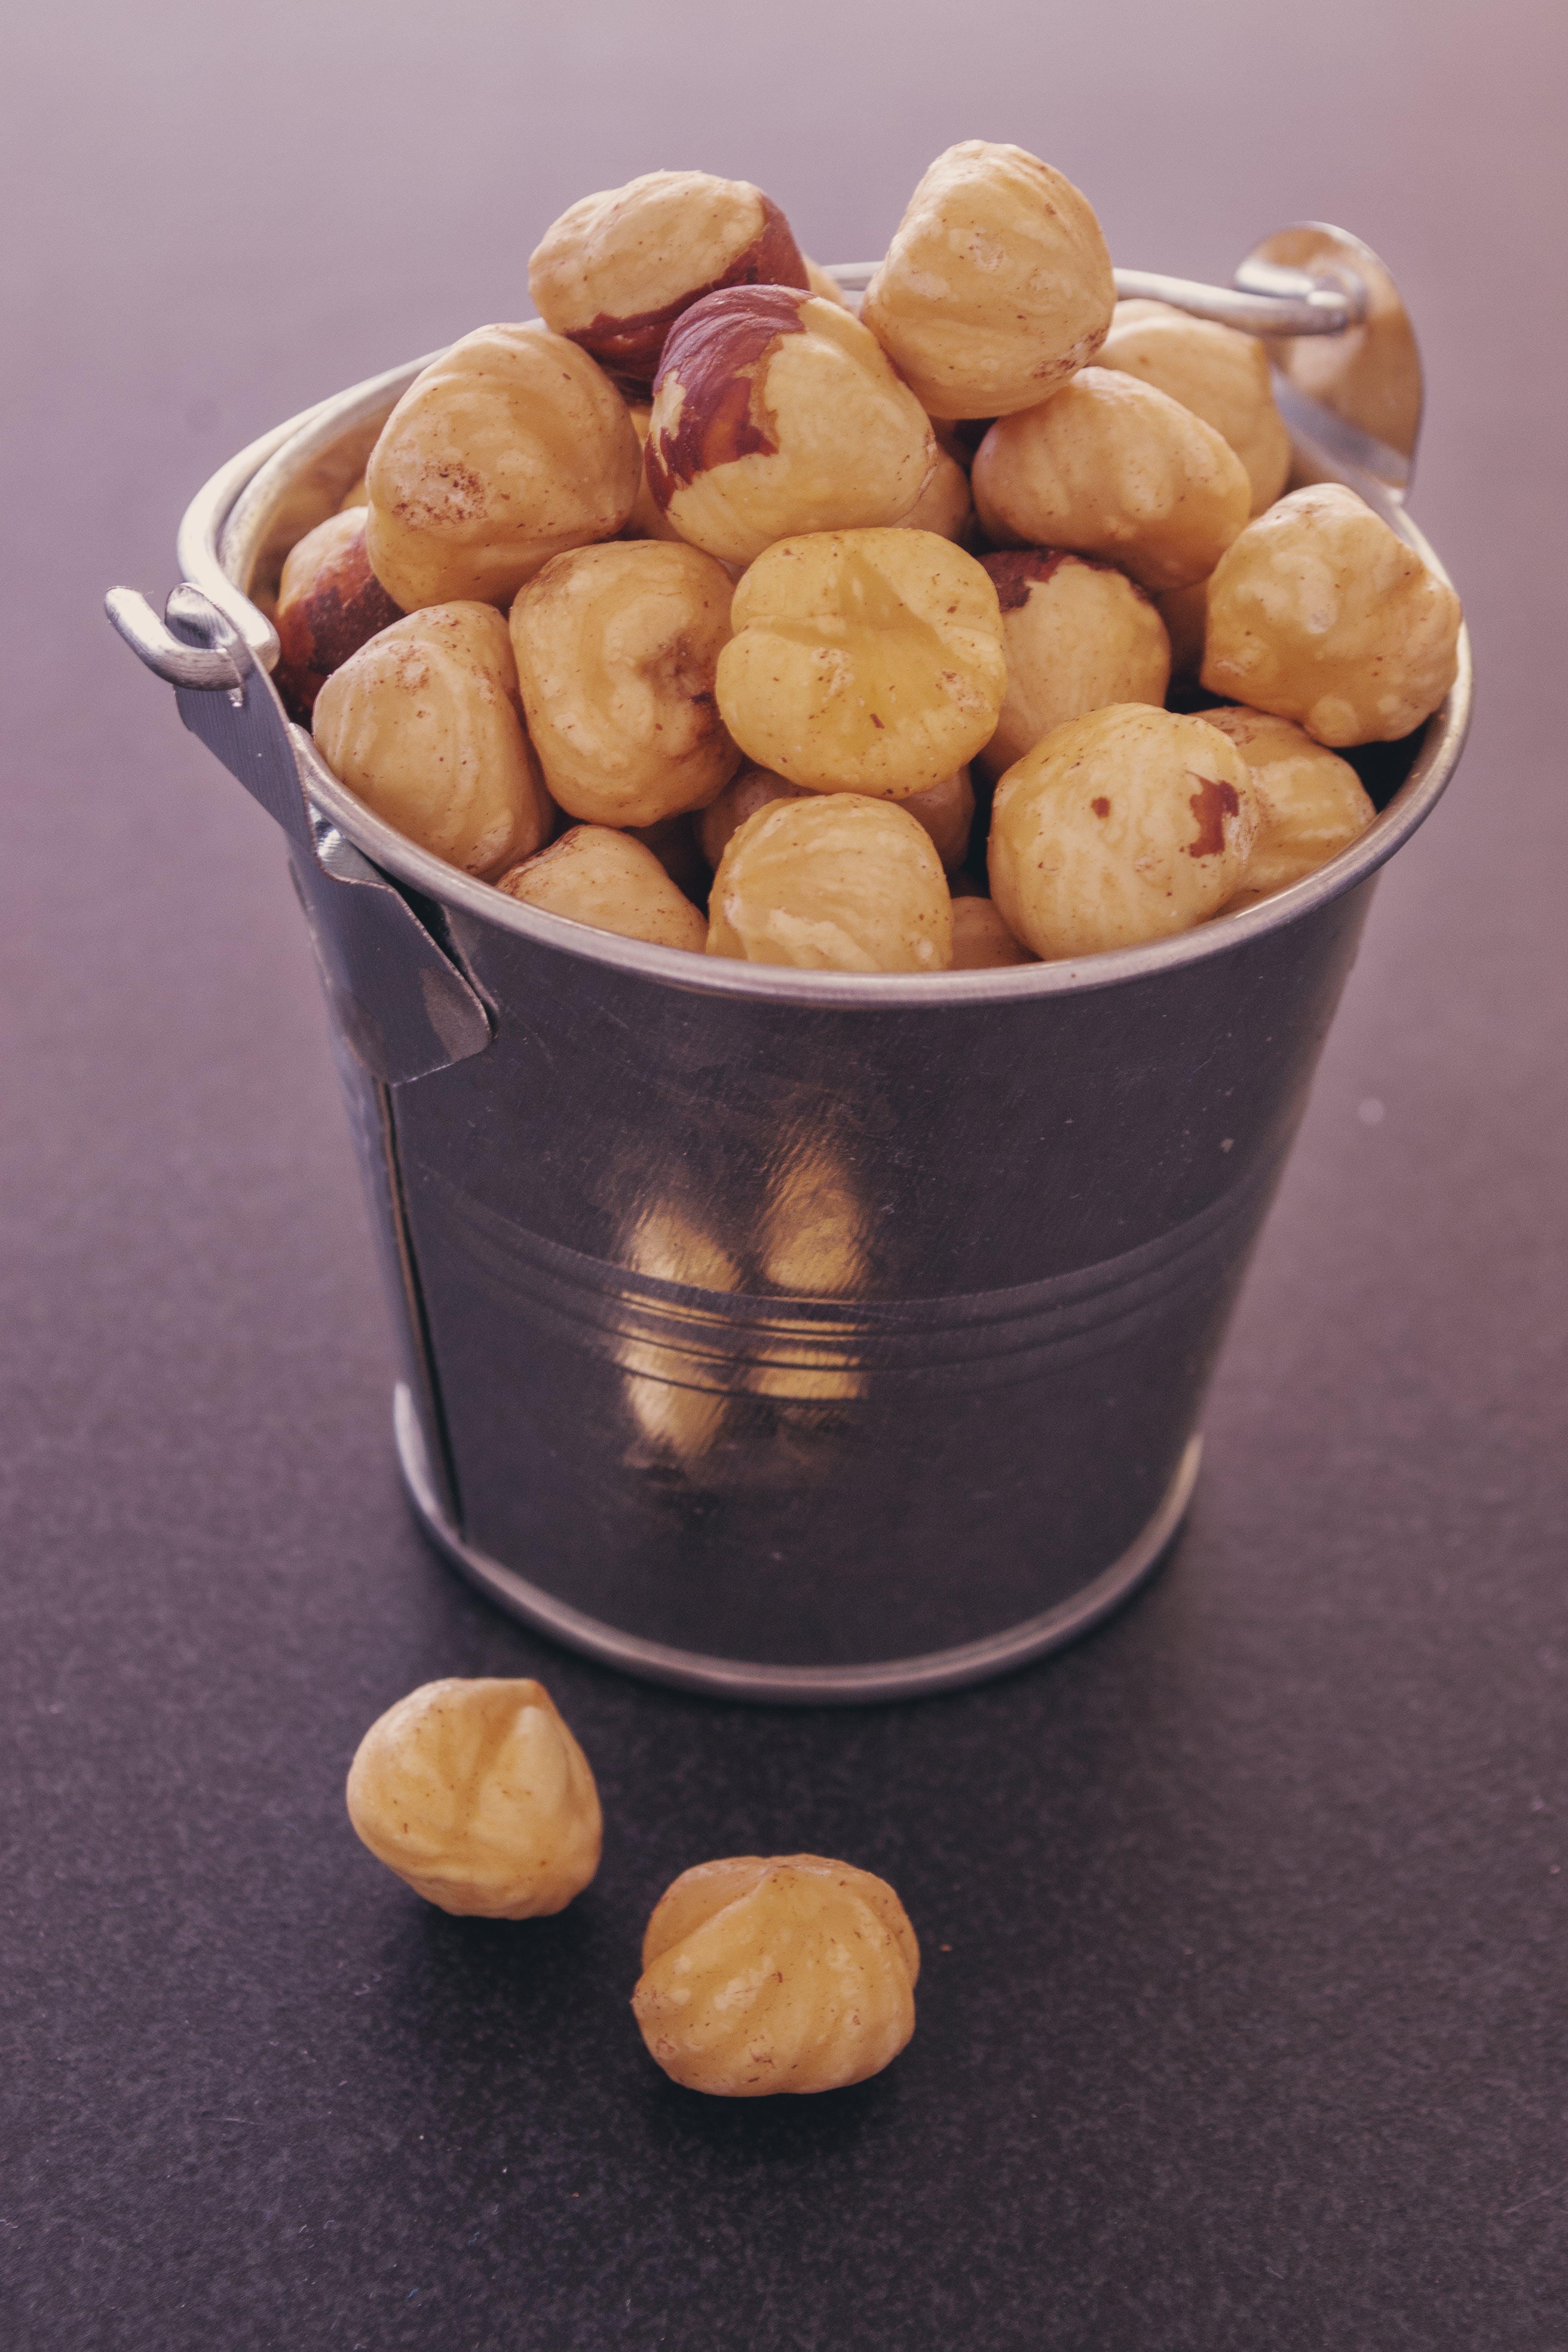 Free stock photo of food, dry, hazelnuts, food photography